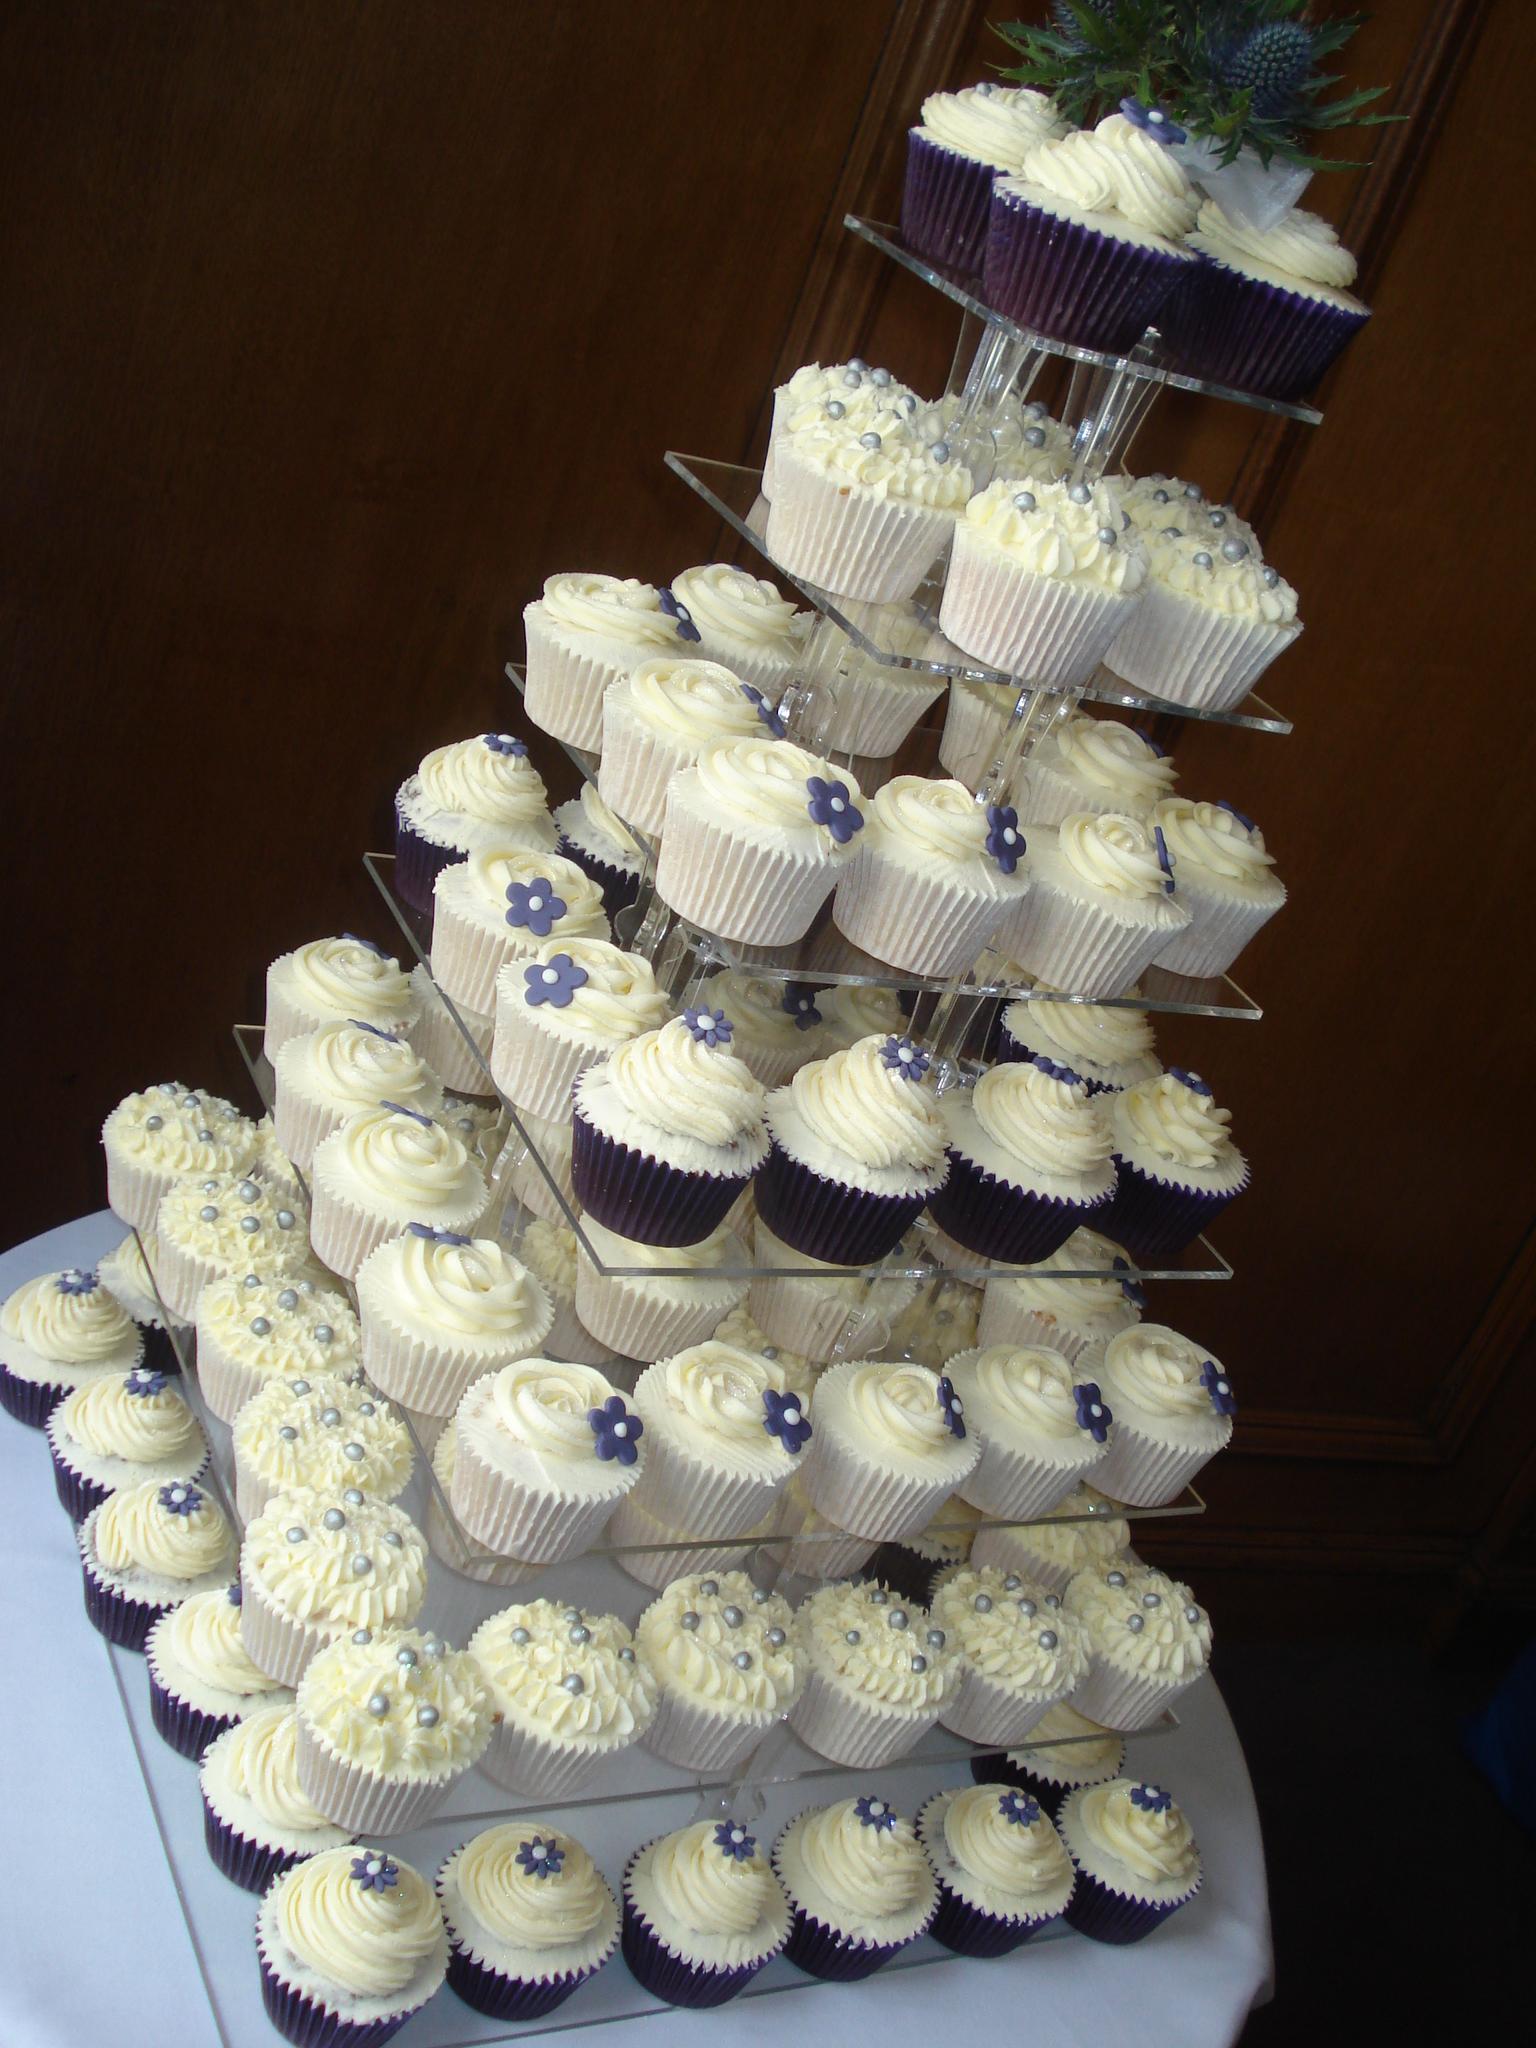 9 Cupcake Wedding Cakes Purple Silver Photo - Silver Wedding ...